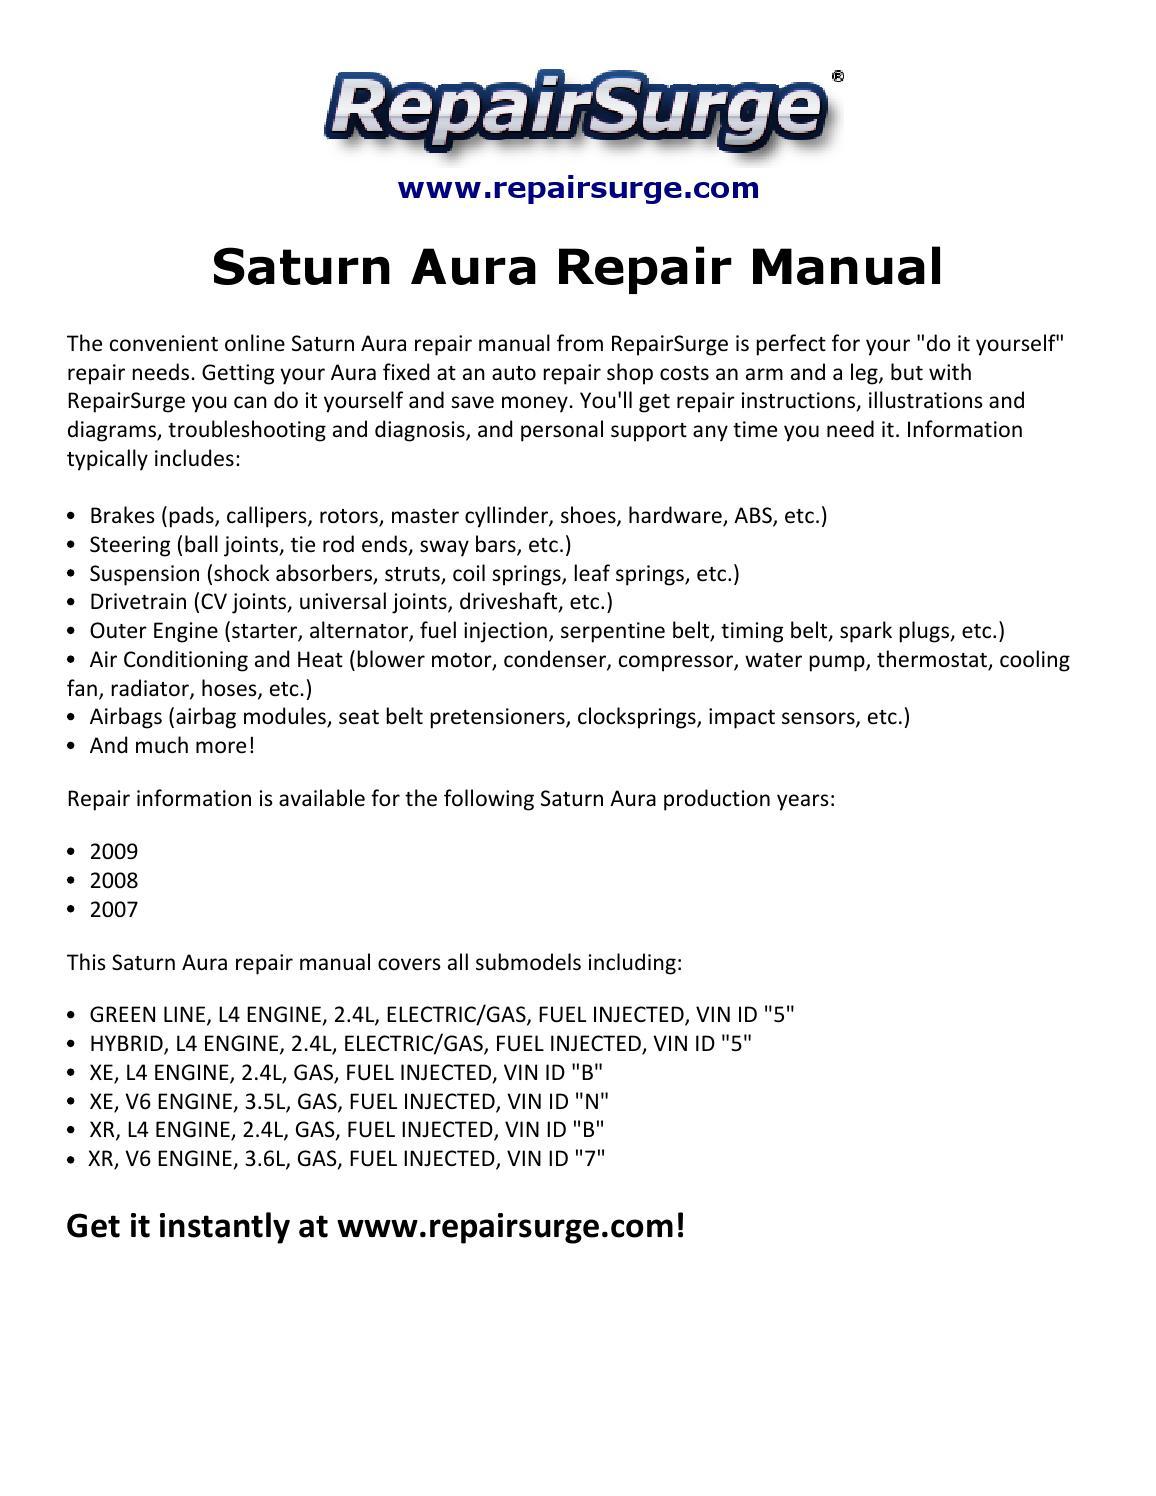 2007 Saturn Aura 3 5 Engine Water Pump Diagram Wiring Library Repair Manual 2009 By Malone Sha Issuu